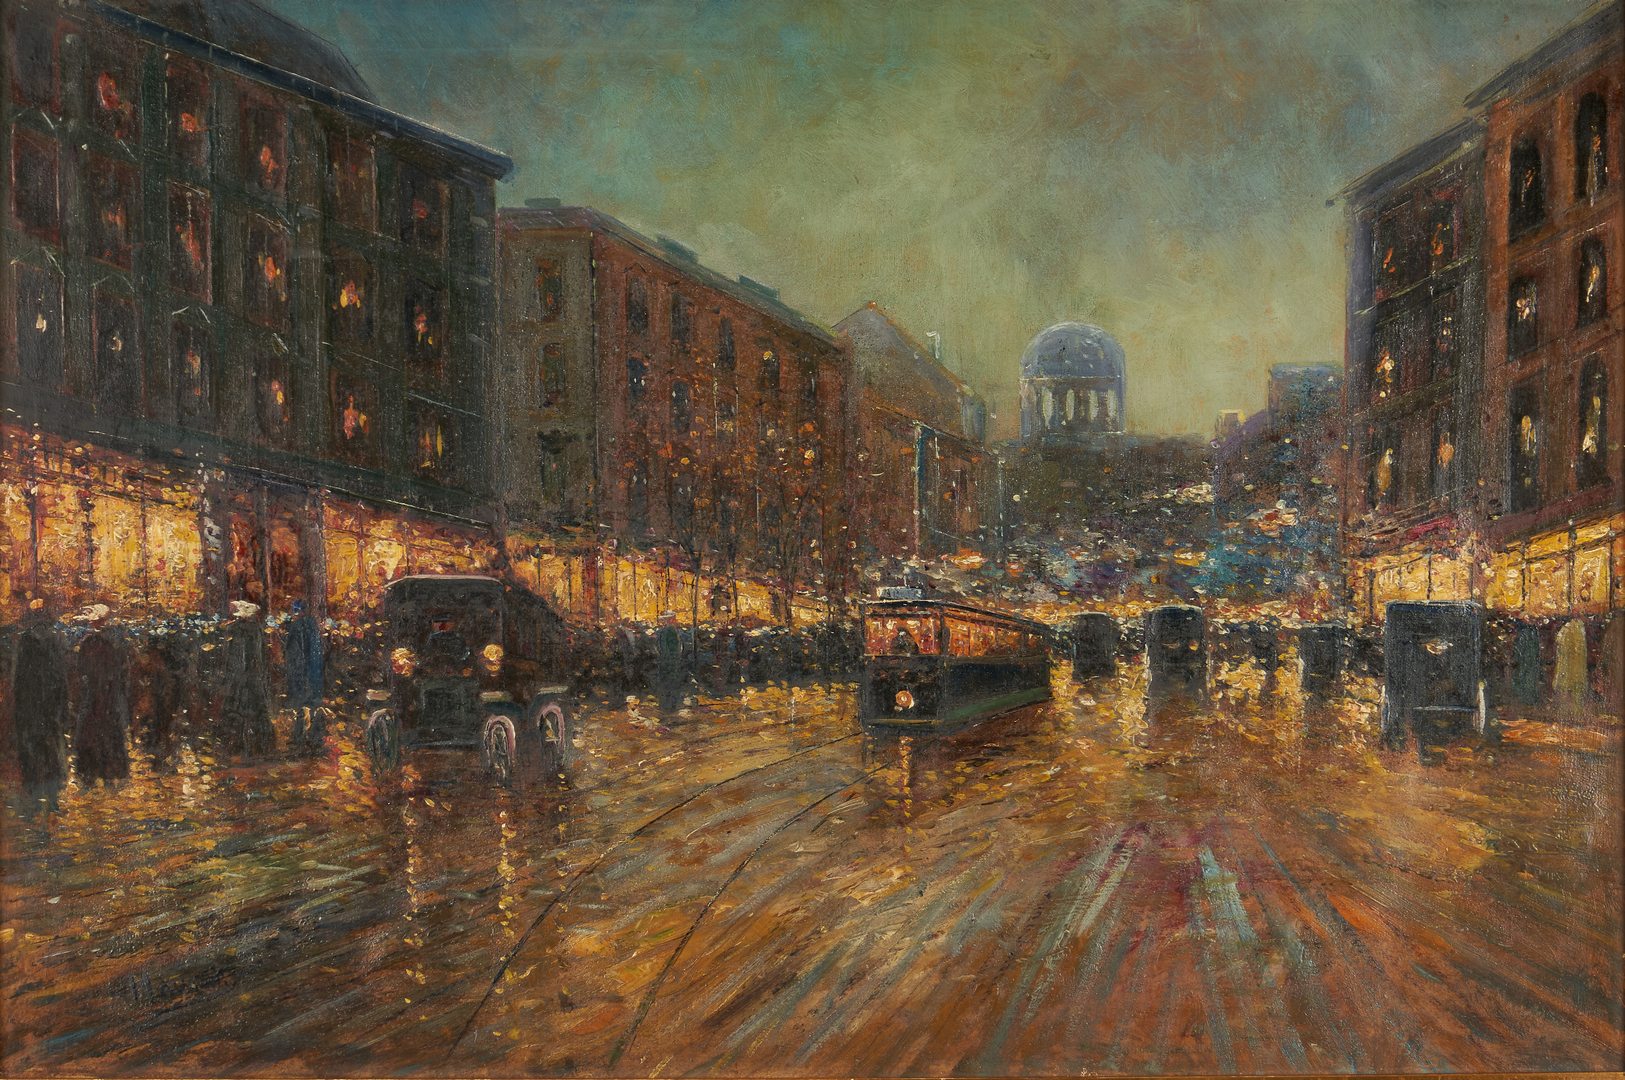 Lot 312: Early 20th c. Parisian O/C Street Scene, Signed